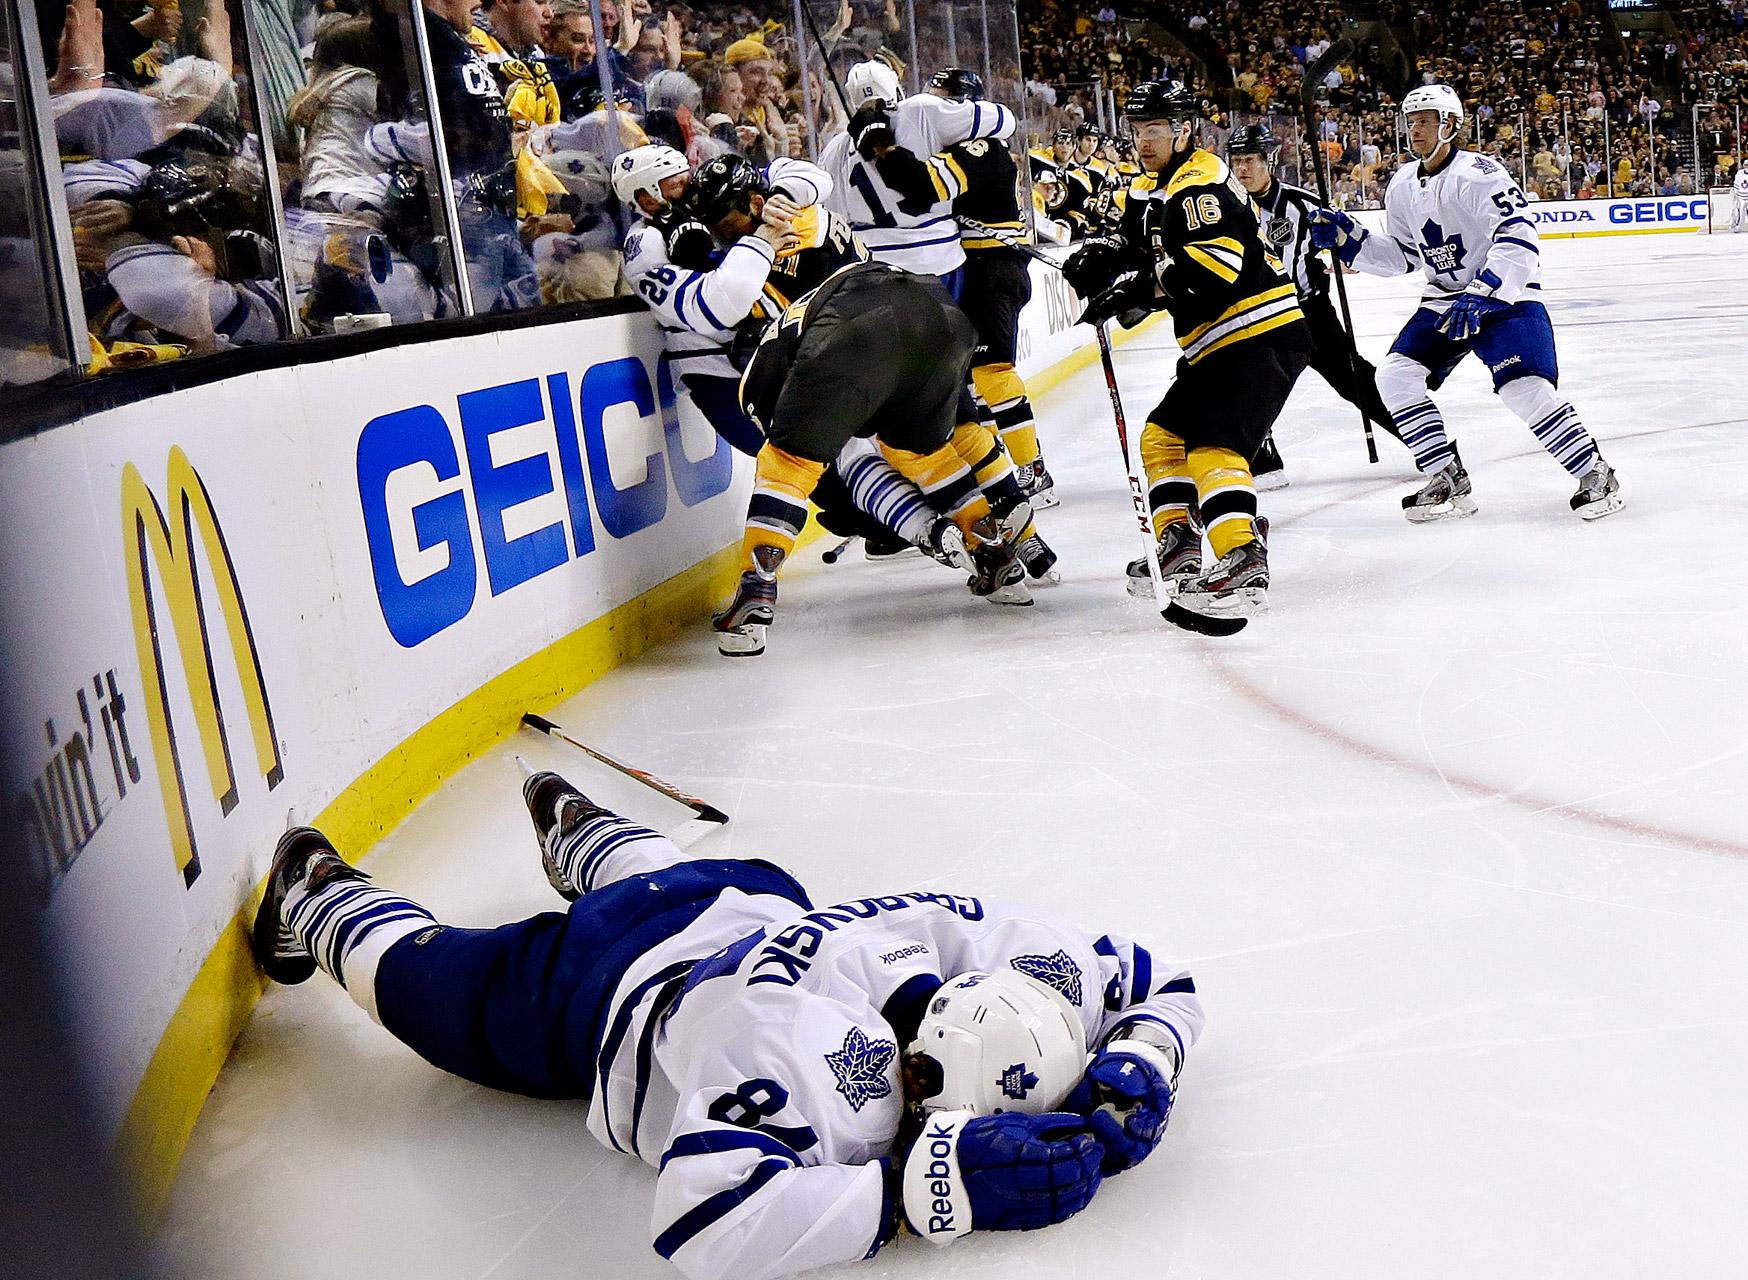 Leafs vs. Bruins